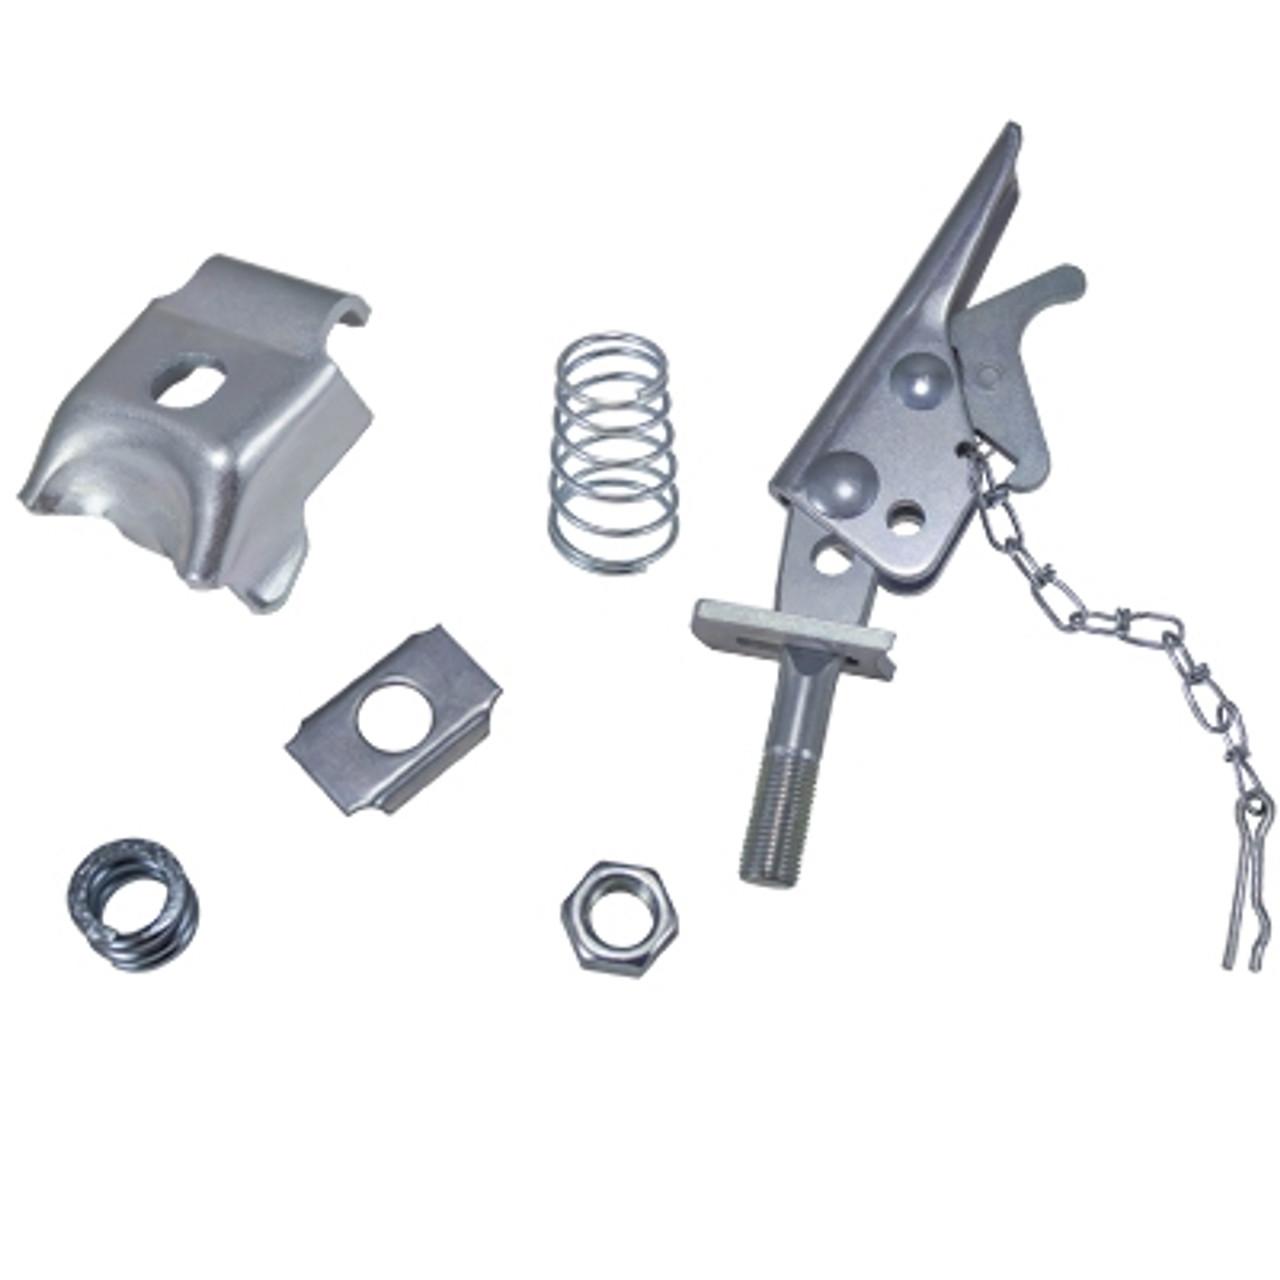 Coupler Repair Kits & Accessories